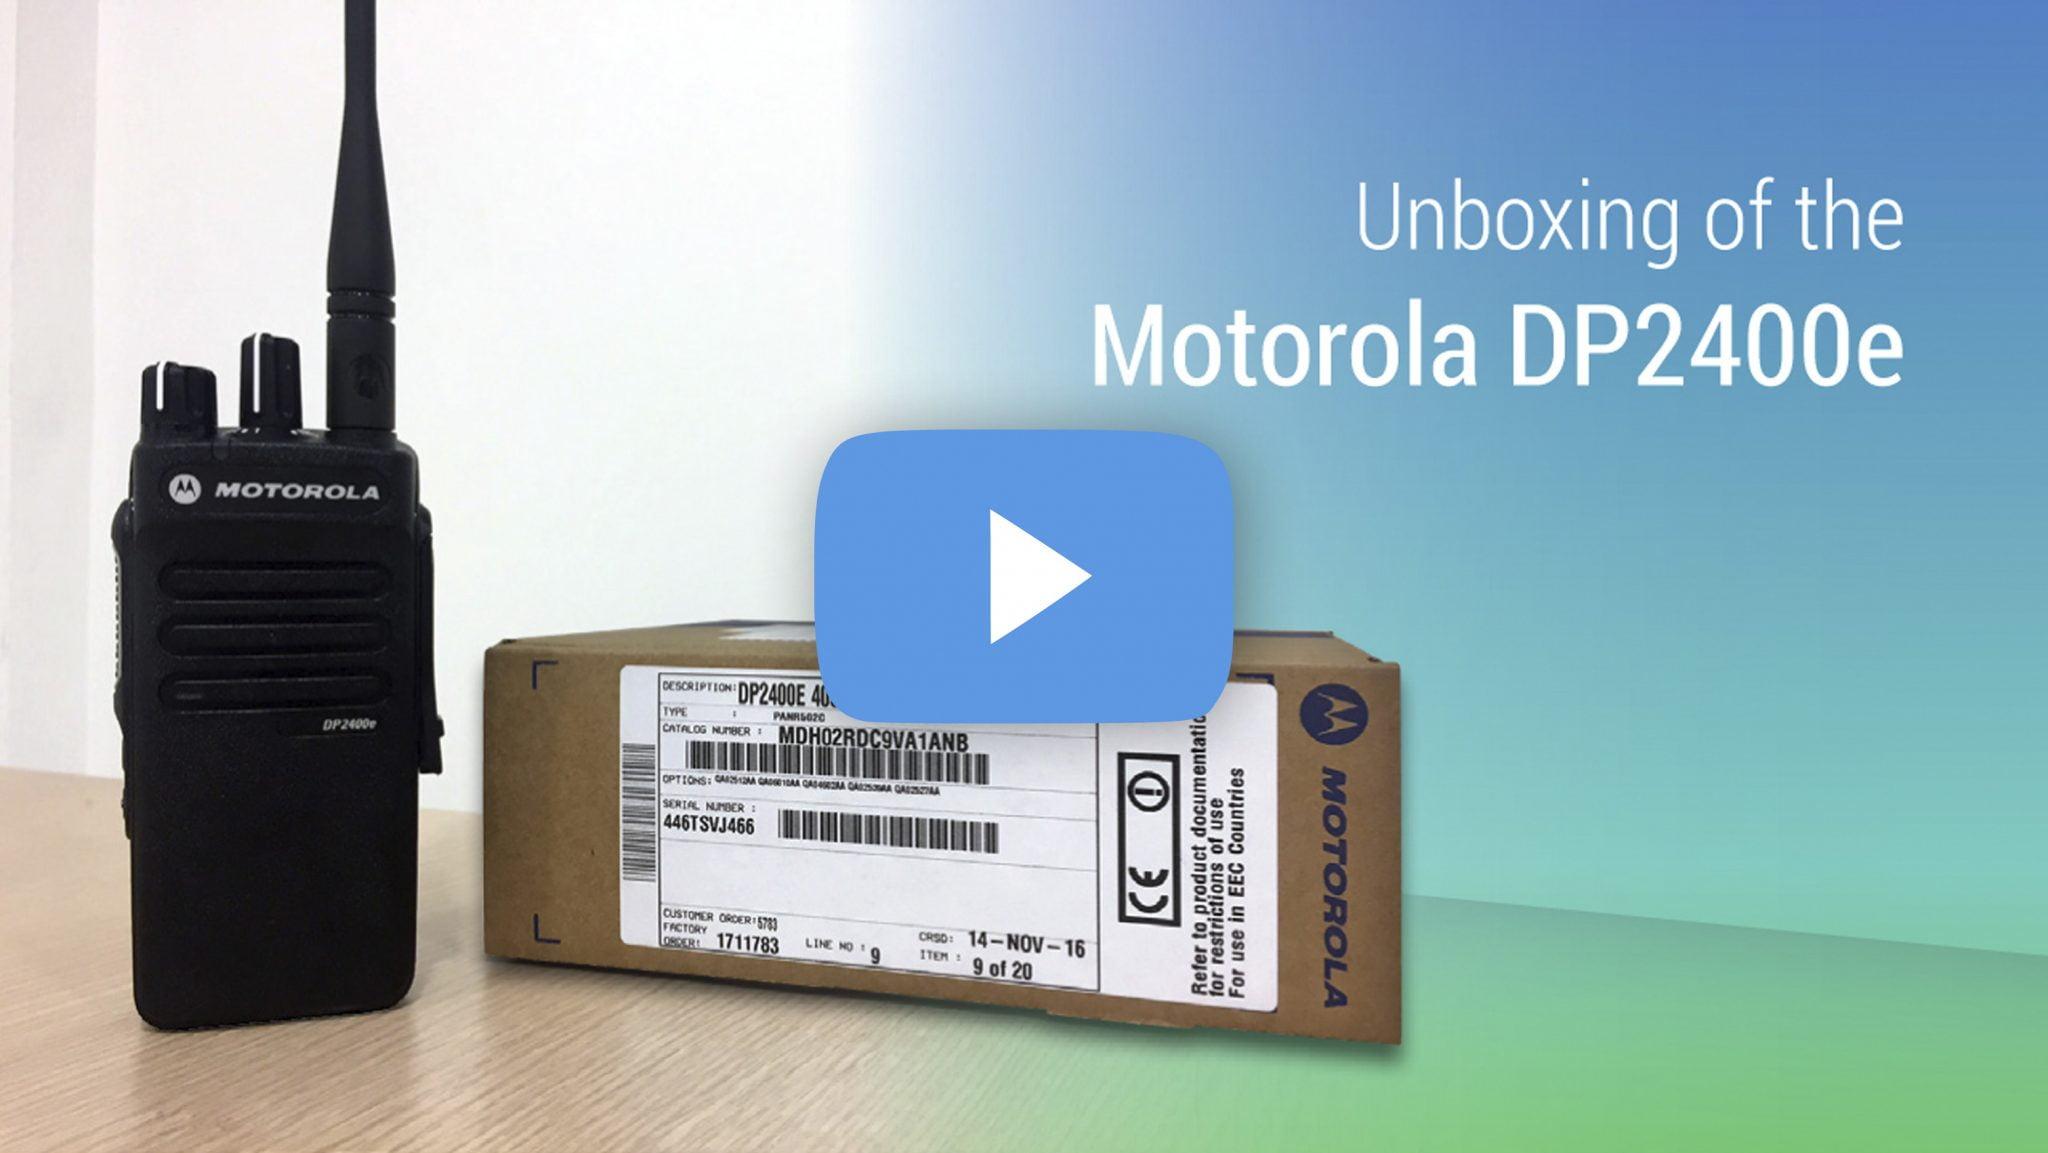 Motorola DP2400e | Brentwood Communications